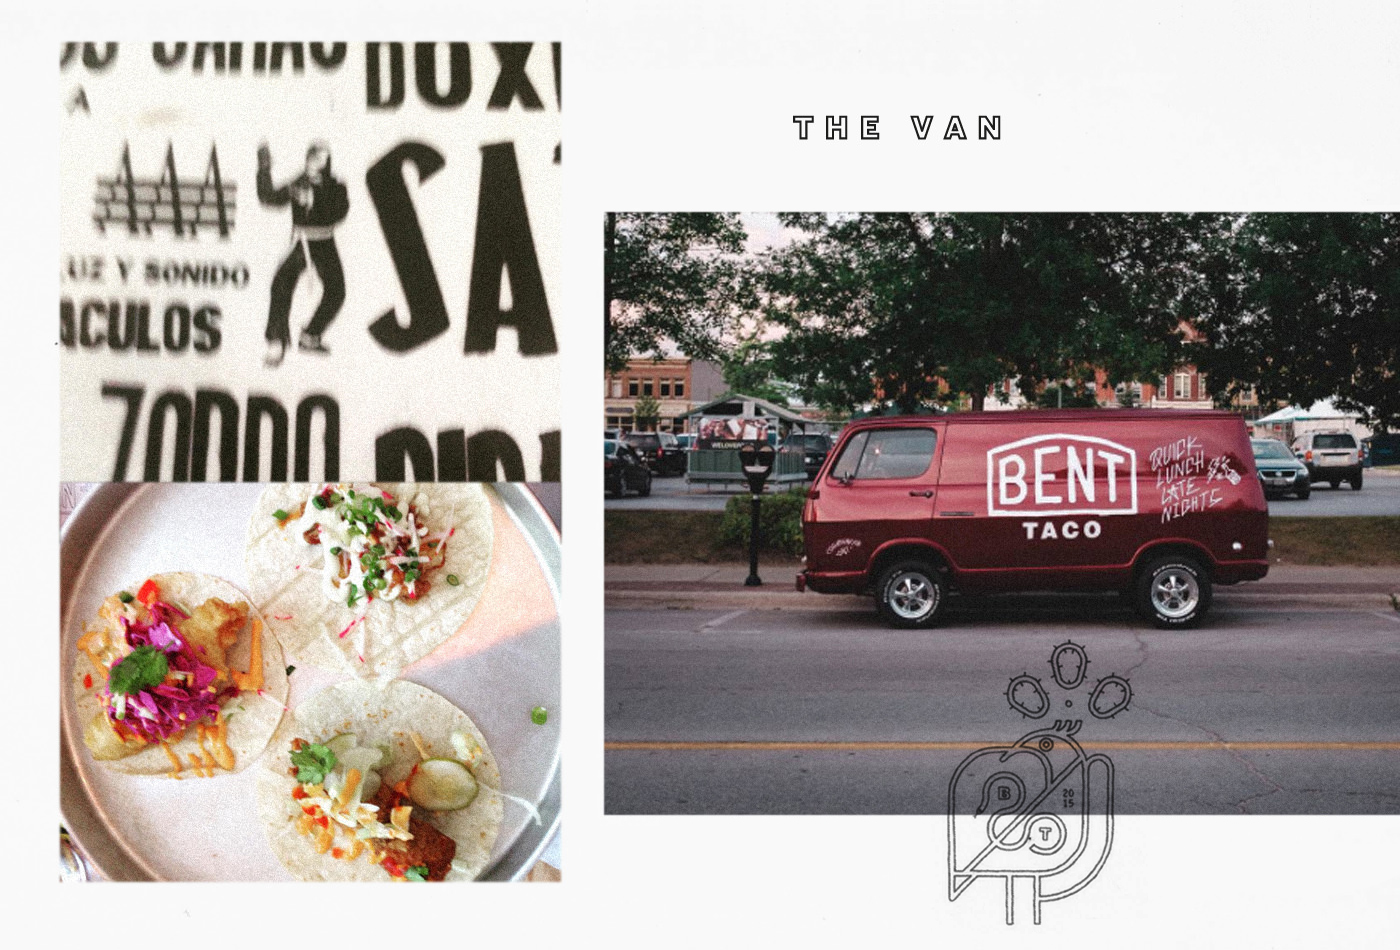 van-benttaco-tacos-burritos-mexican-canada-ontario-restaurant-collingwood-vacaliebres-branding